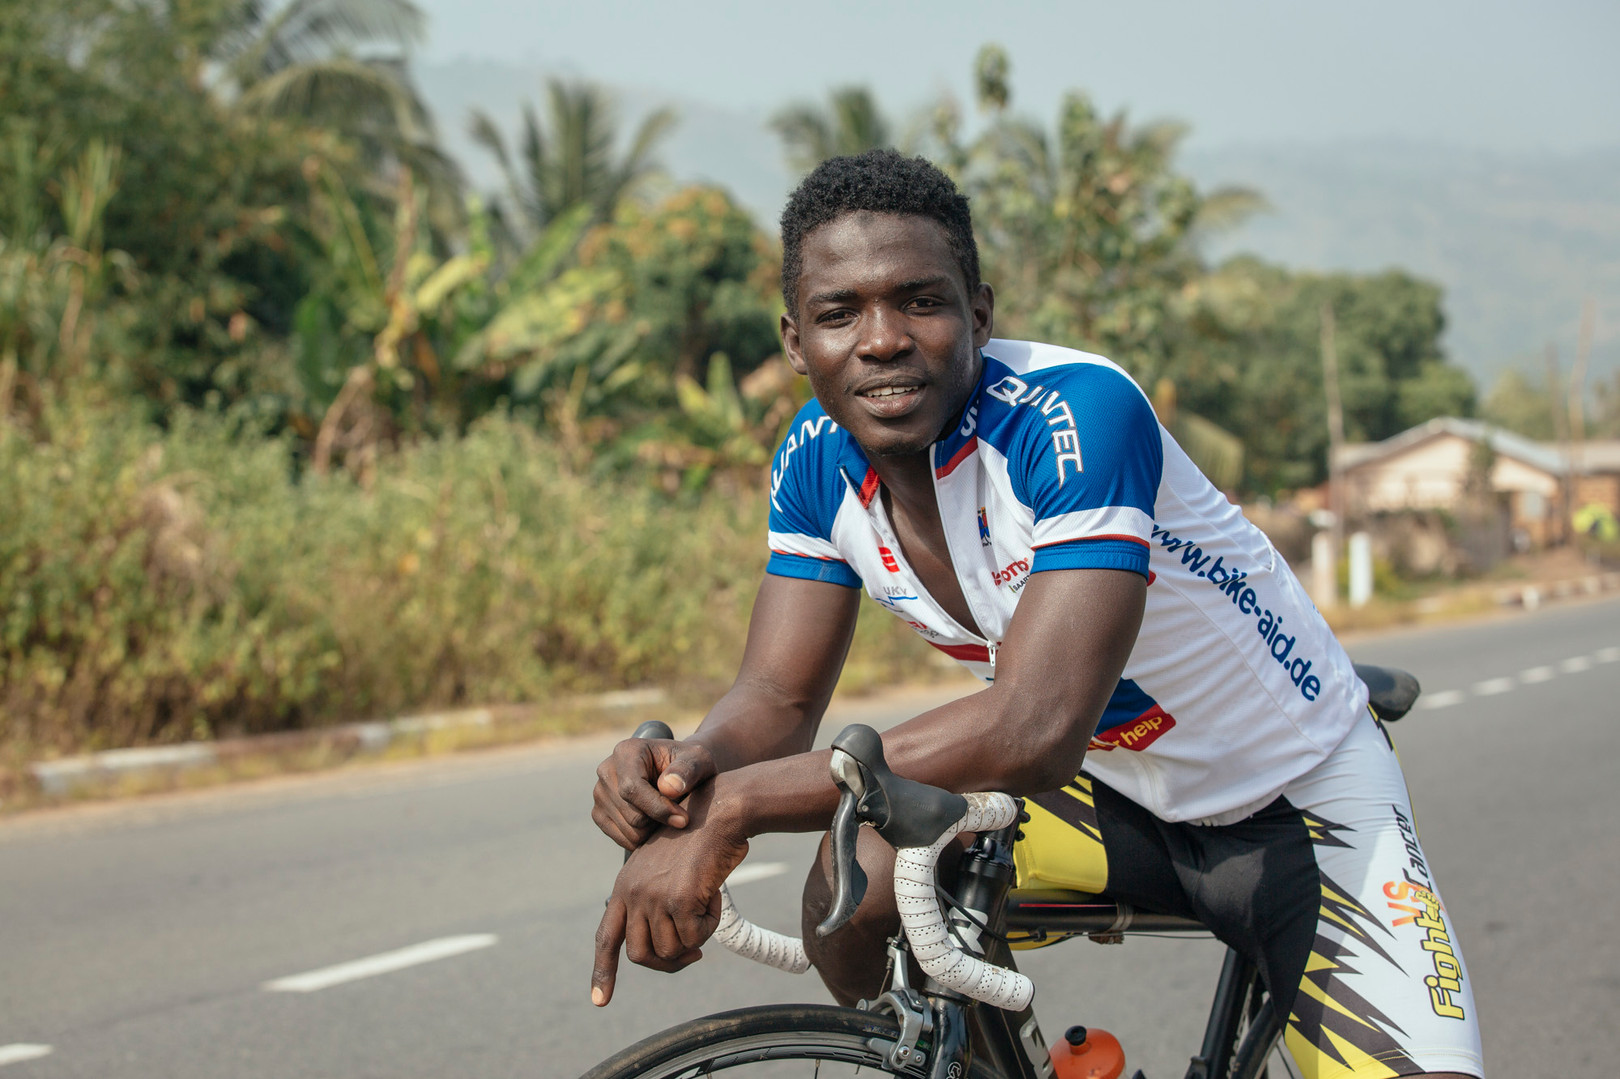 0266_Togo_KpaliméCyclingProject_20151221